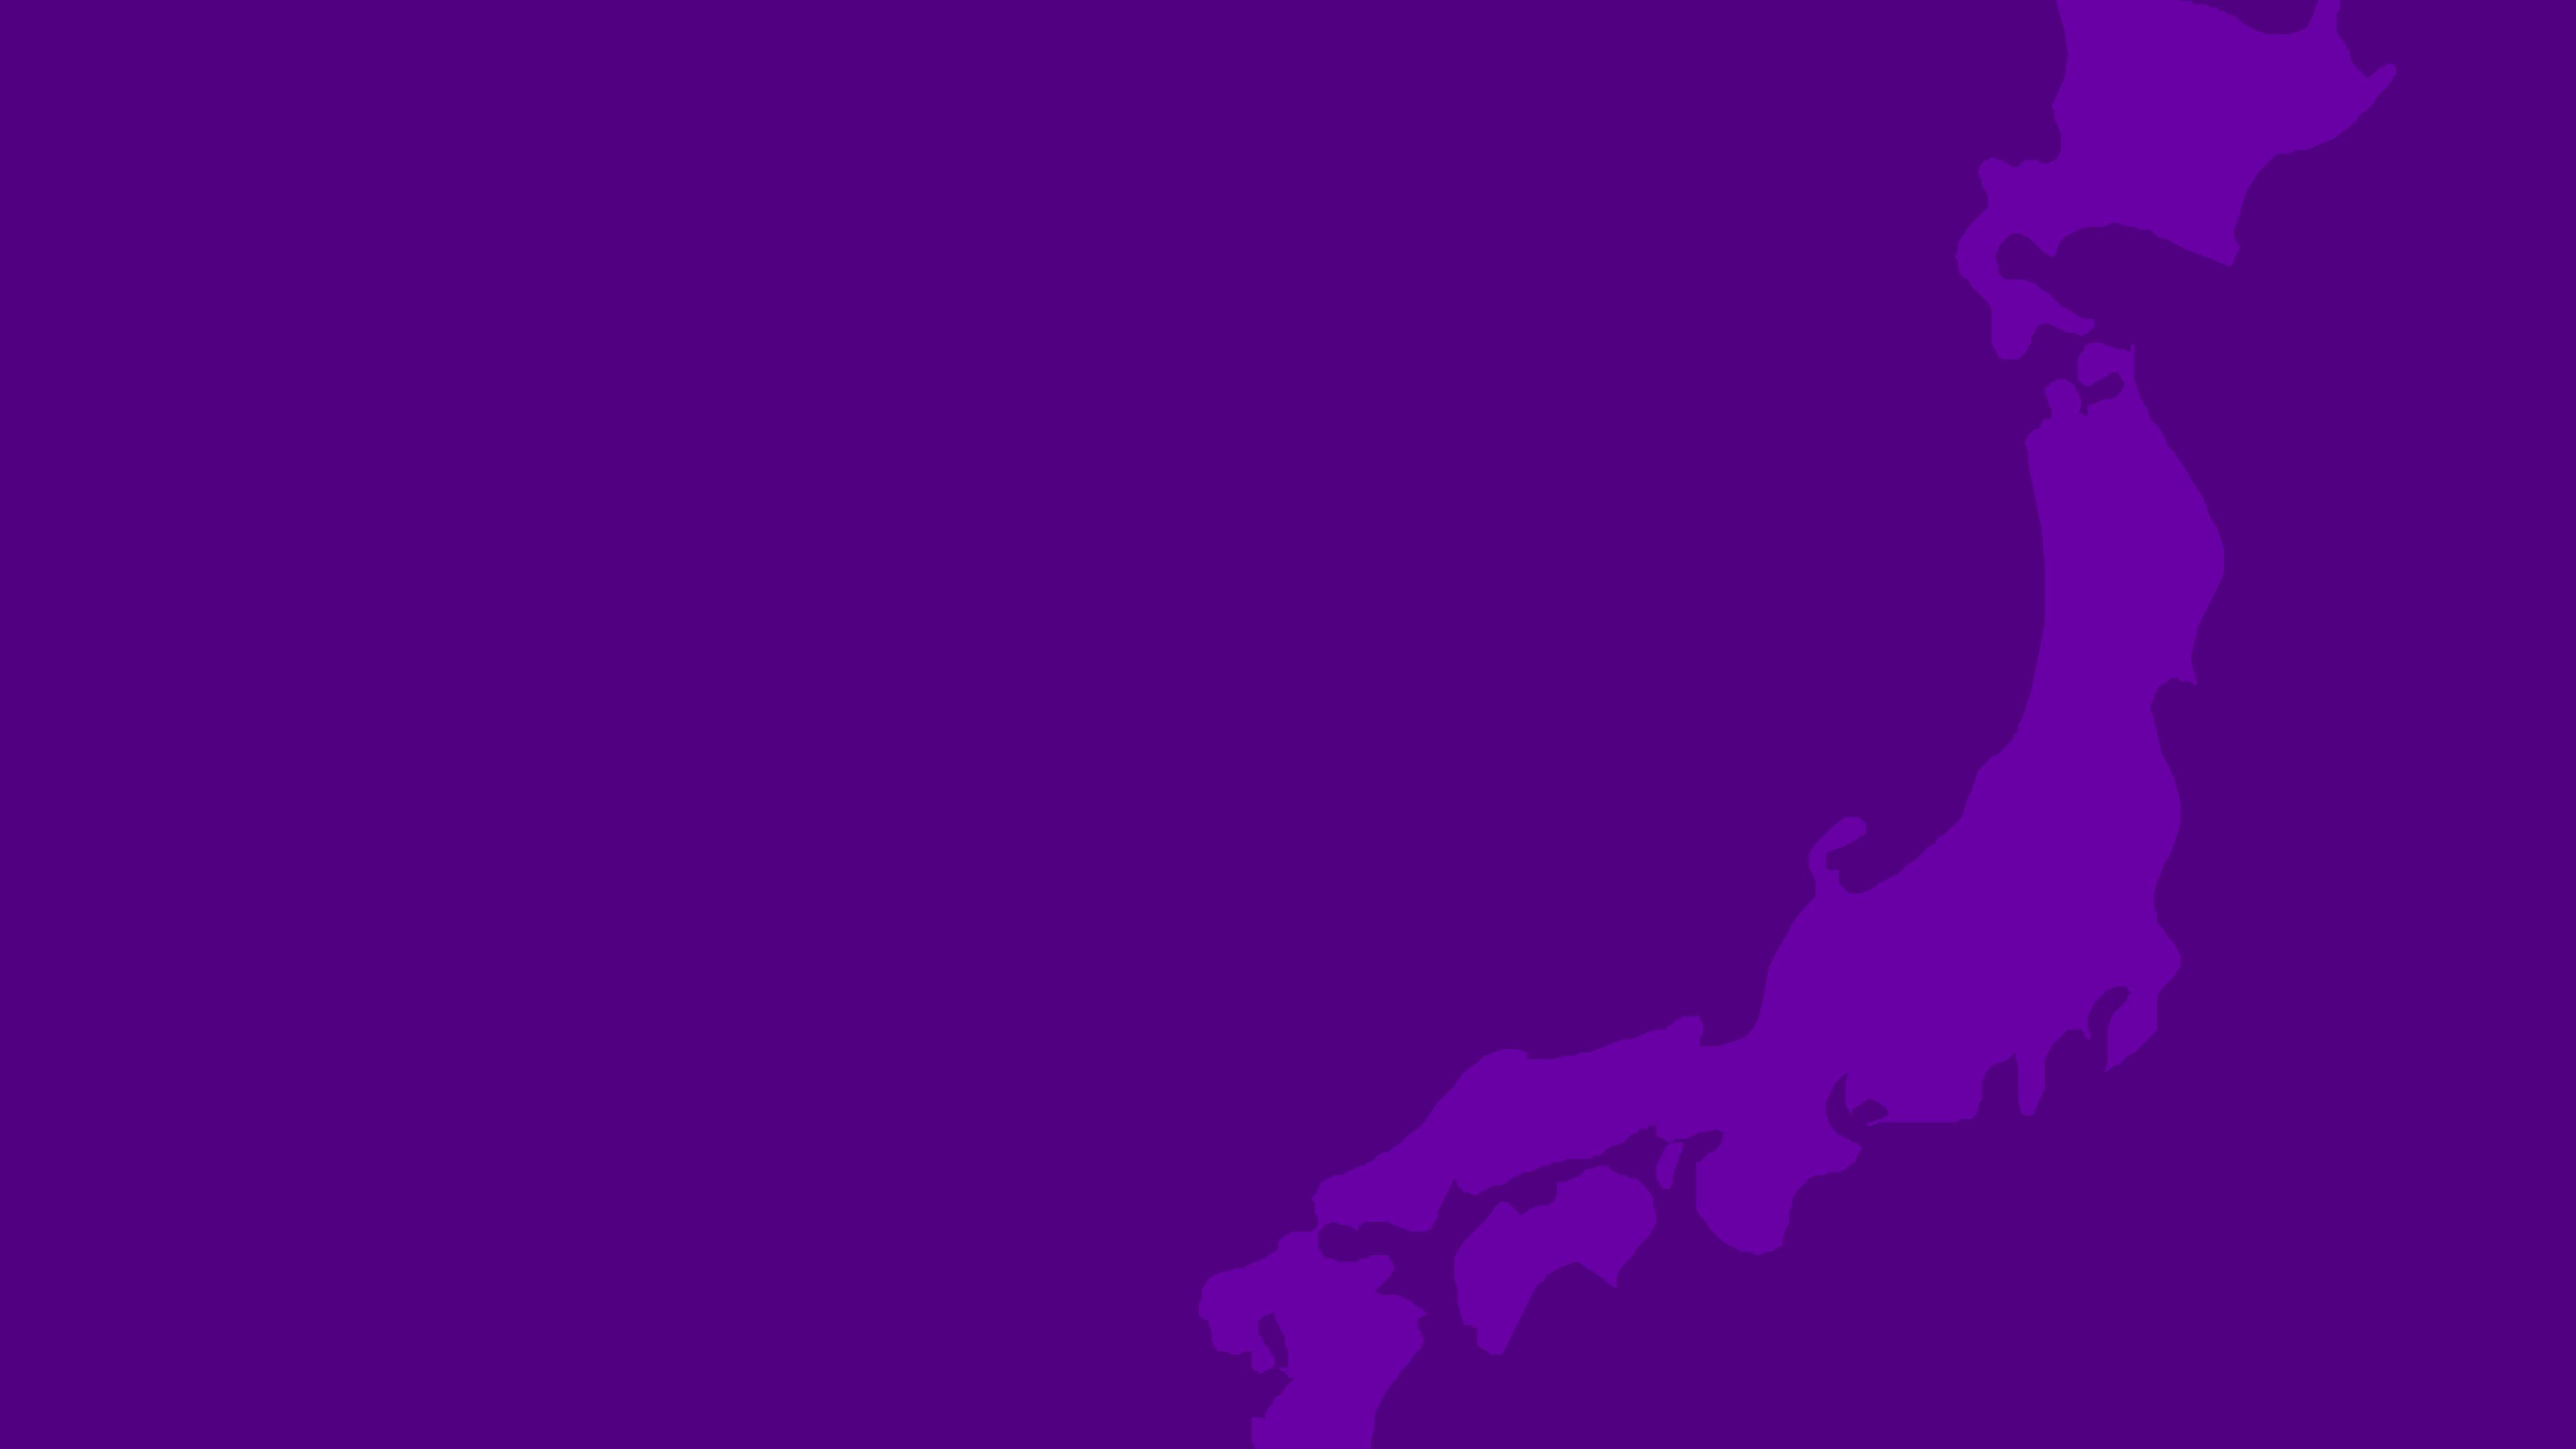 45+ Purple Minimalist Wallpapers on WallpaperSafari